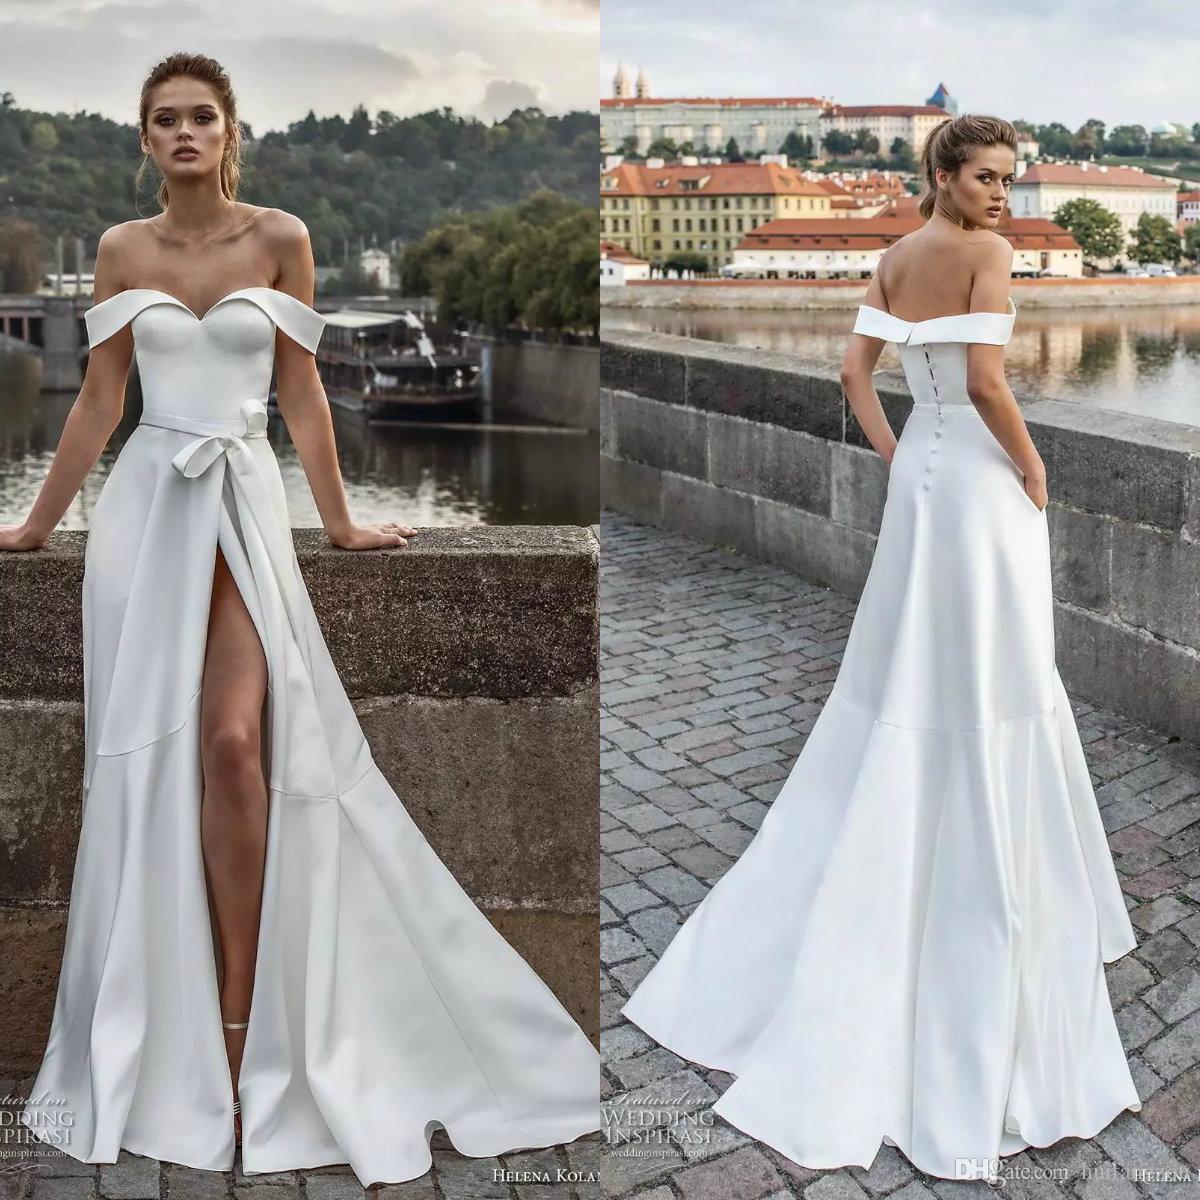 Discount Designer Wedding Gowns: Discount 2019 Satin Designer Wedding Dresses Off Shoulder